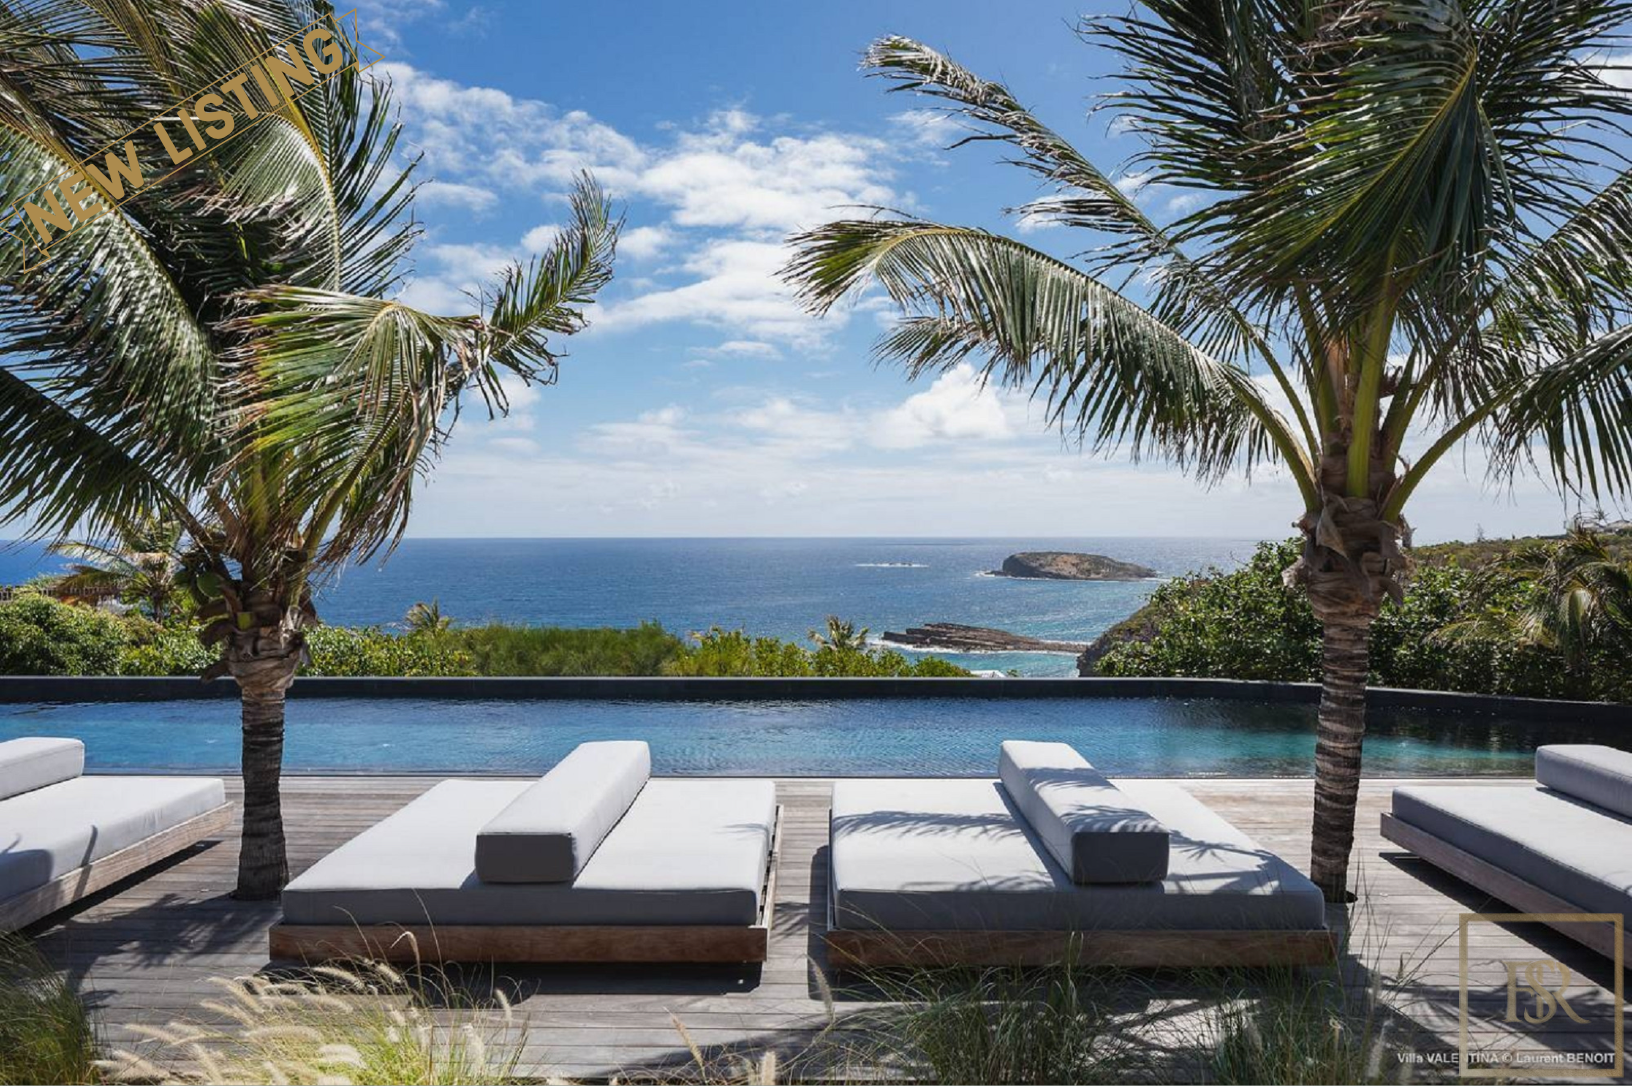 Villa Valentina Estate Pt Milou, St Barth / St Barts for sale For Super Rich